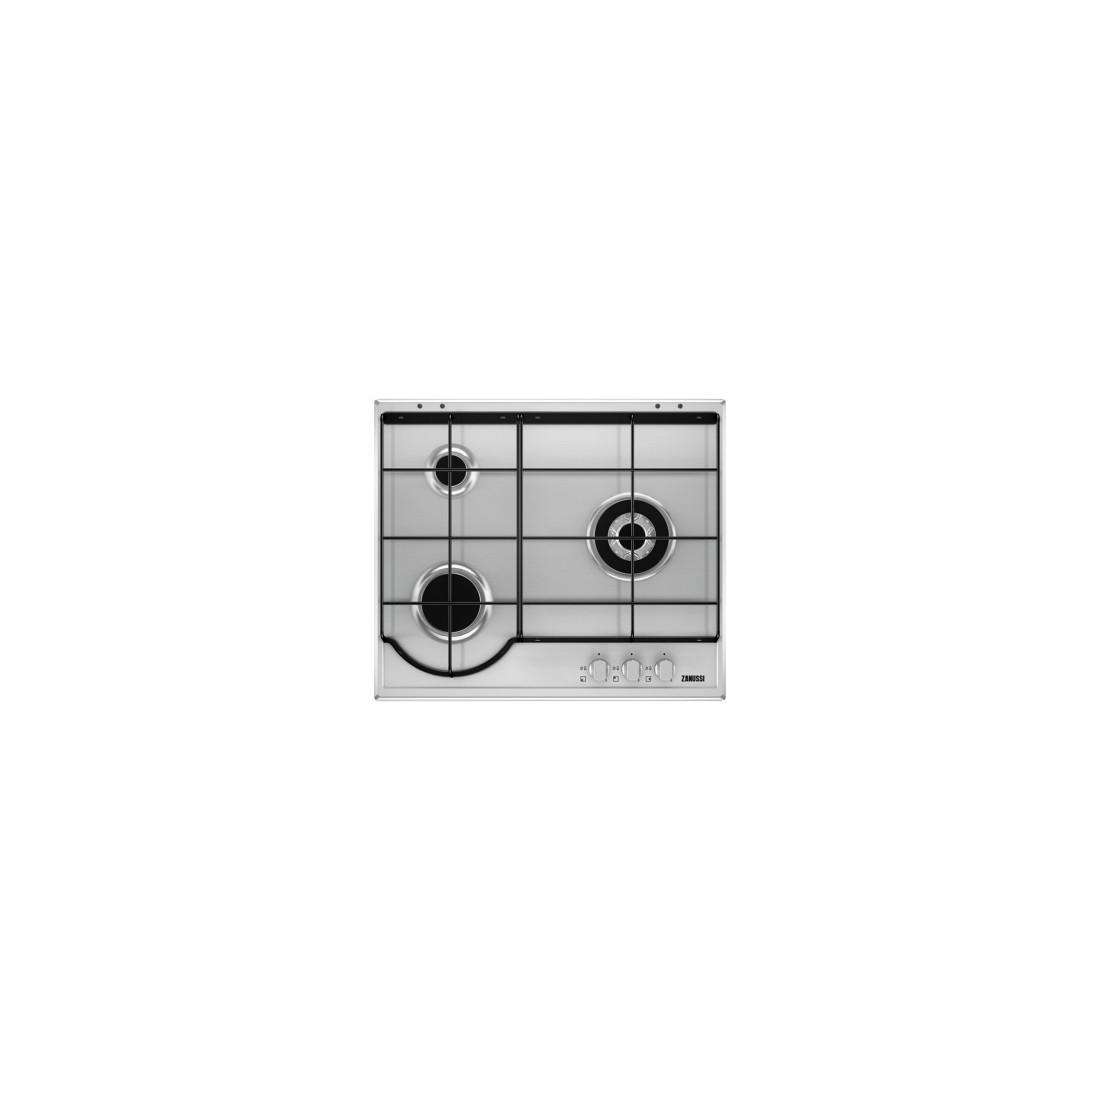 Placa Gas - Zanussi ZGG65334XA, 3 Zonas, 60 cm, Acero Inoxidable, Sin Marco